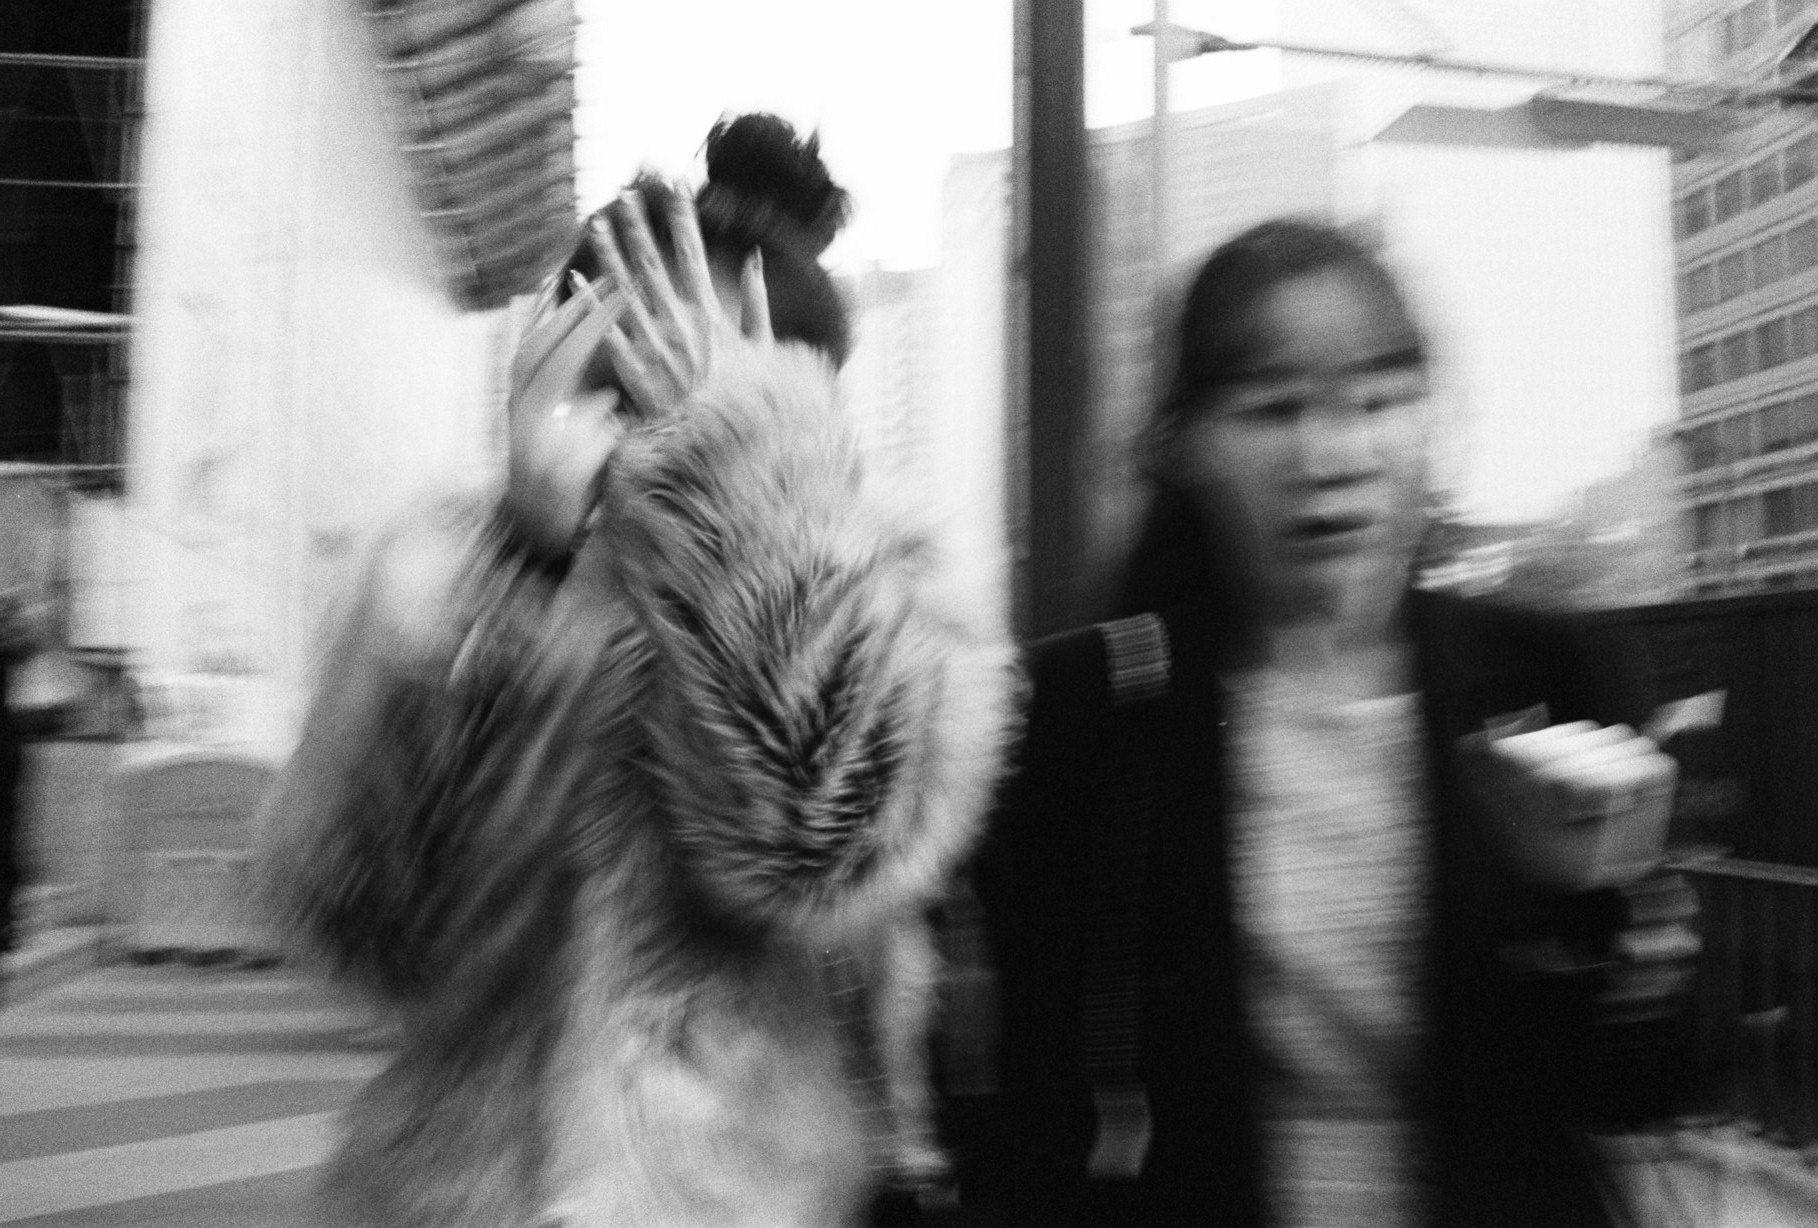 eric kim photography black and white - 6779811073_d7fcbdd732_o